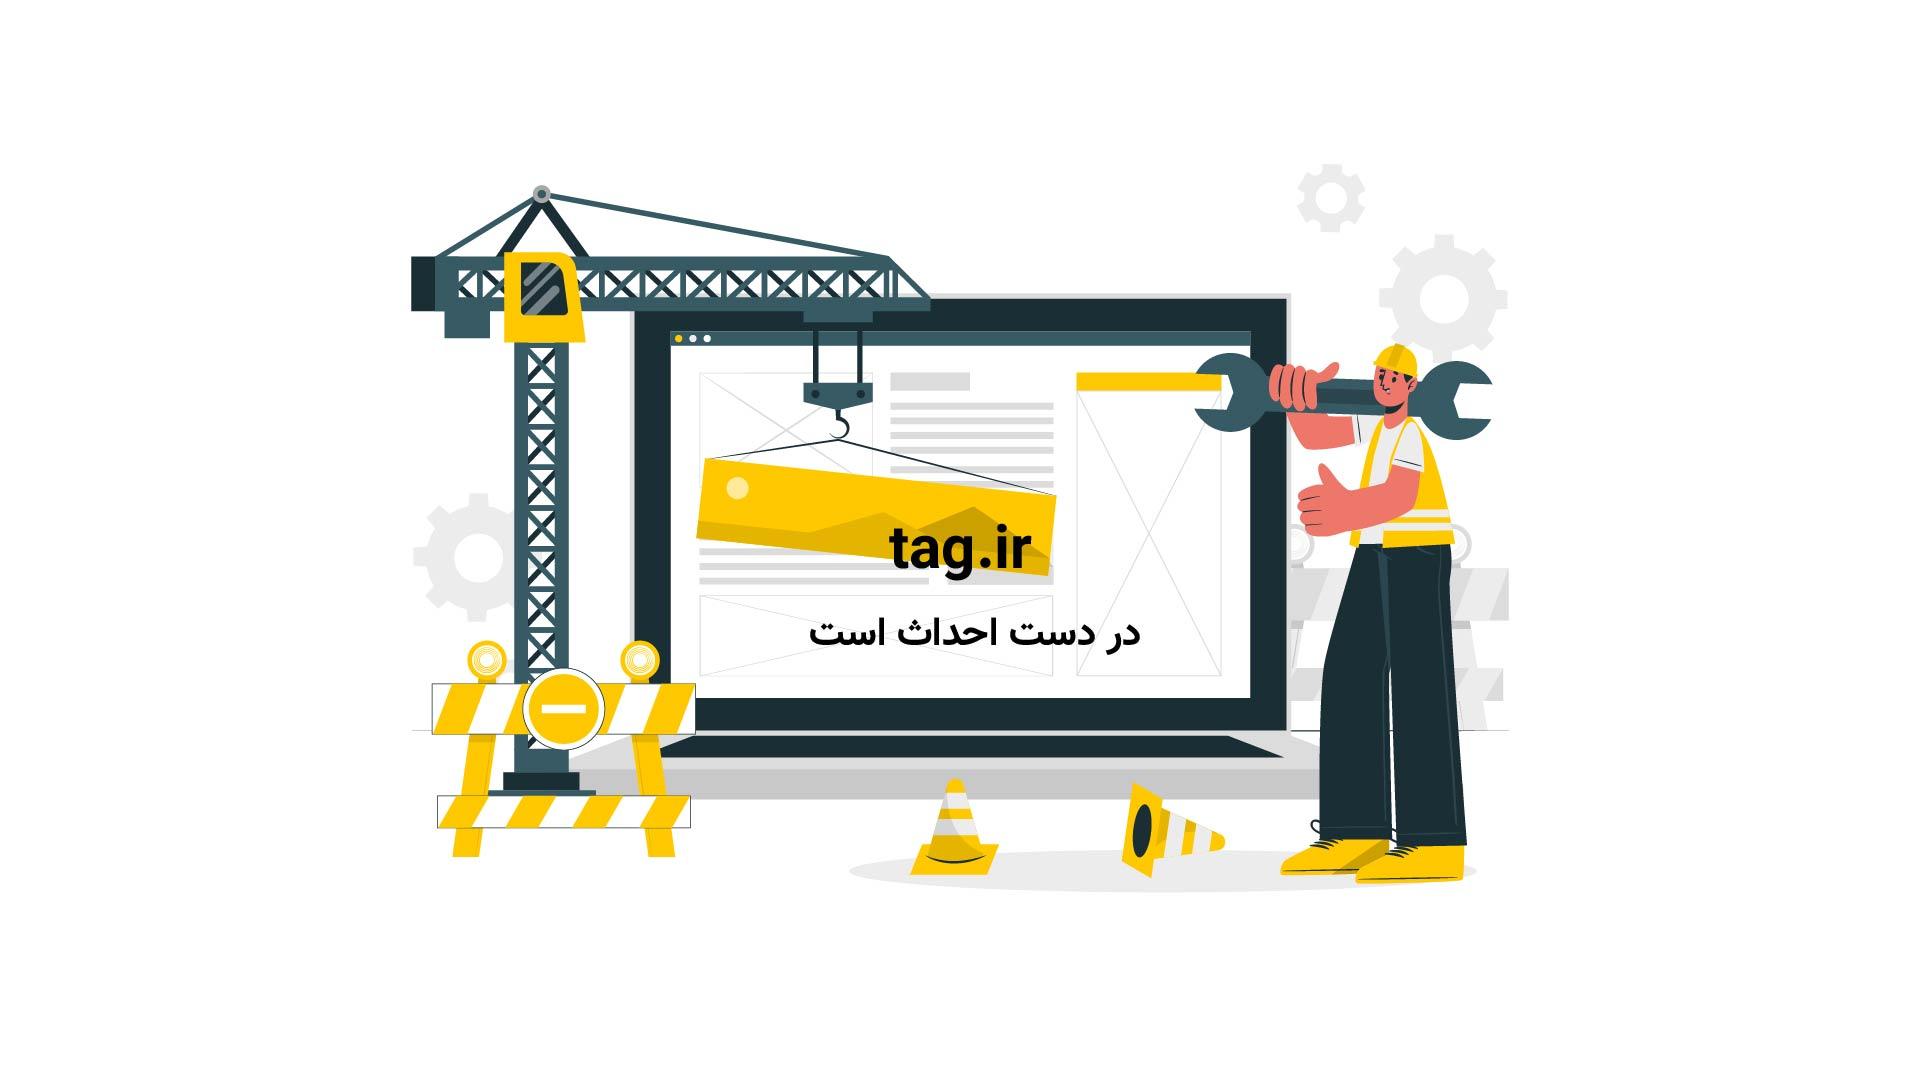 زنبور | تگ